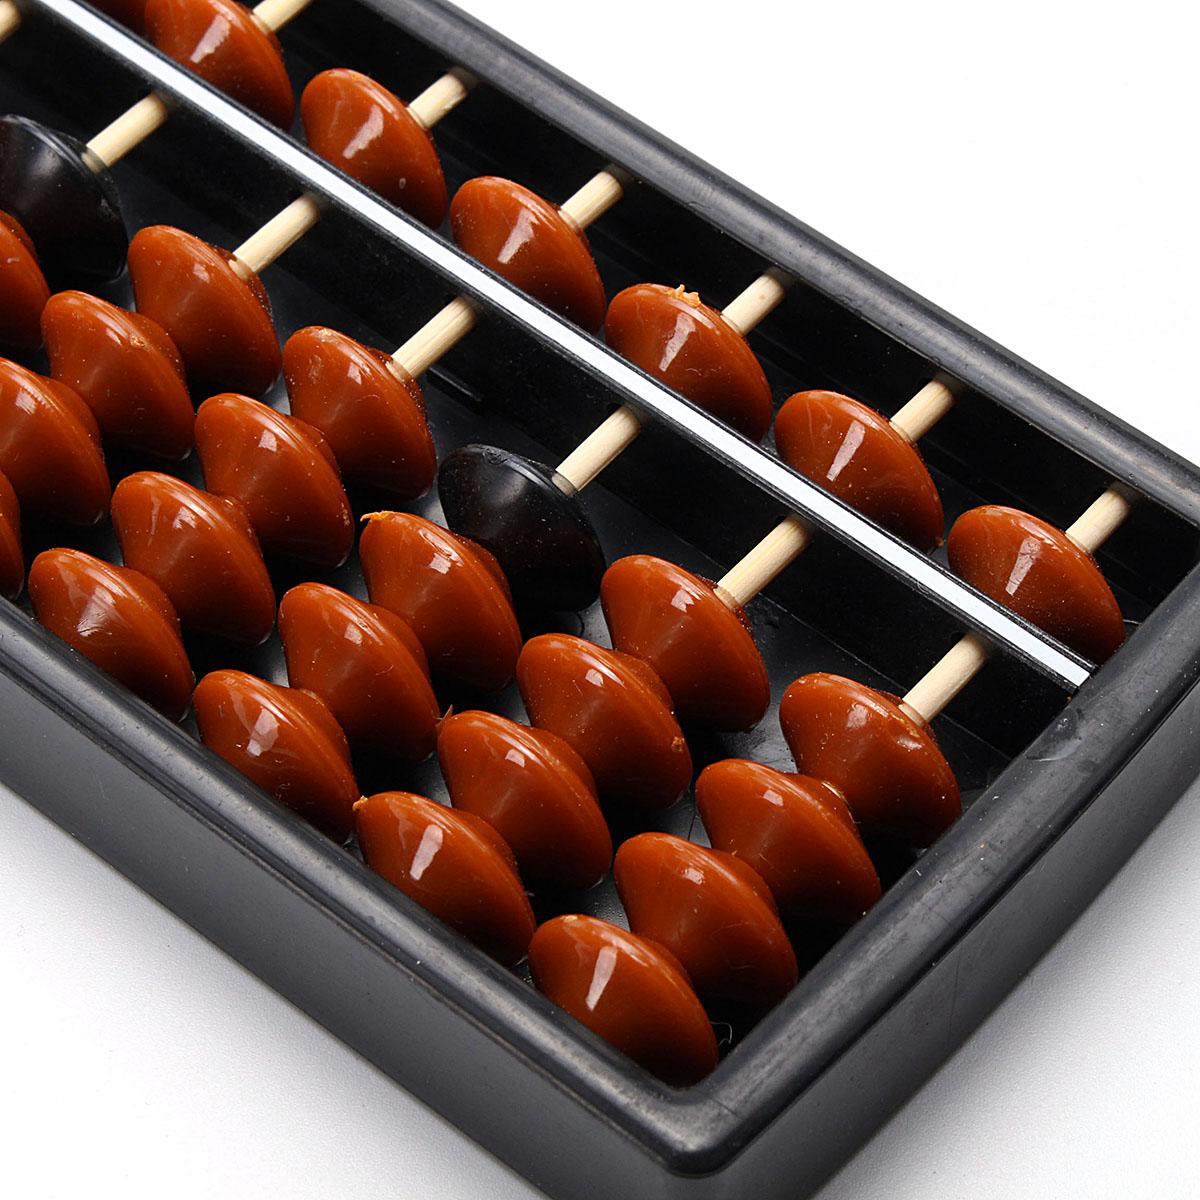 15 Rods Abacus Soroban Beads Column Kid School Learning Aid Tool